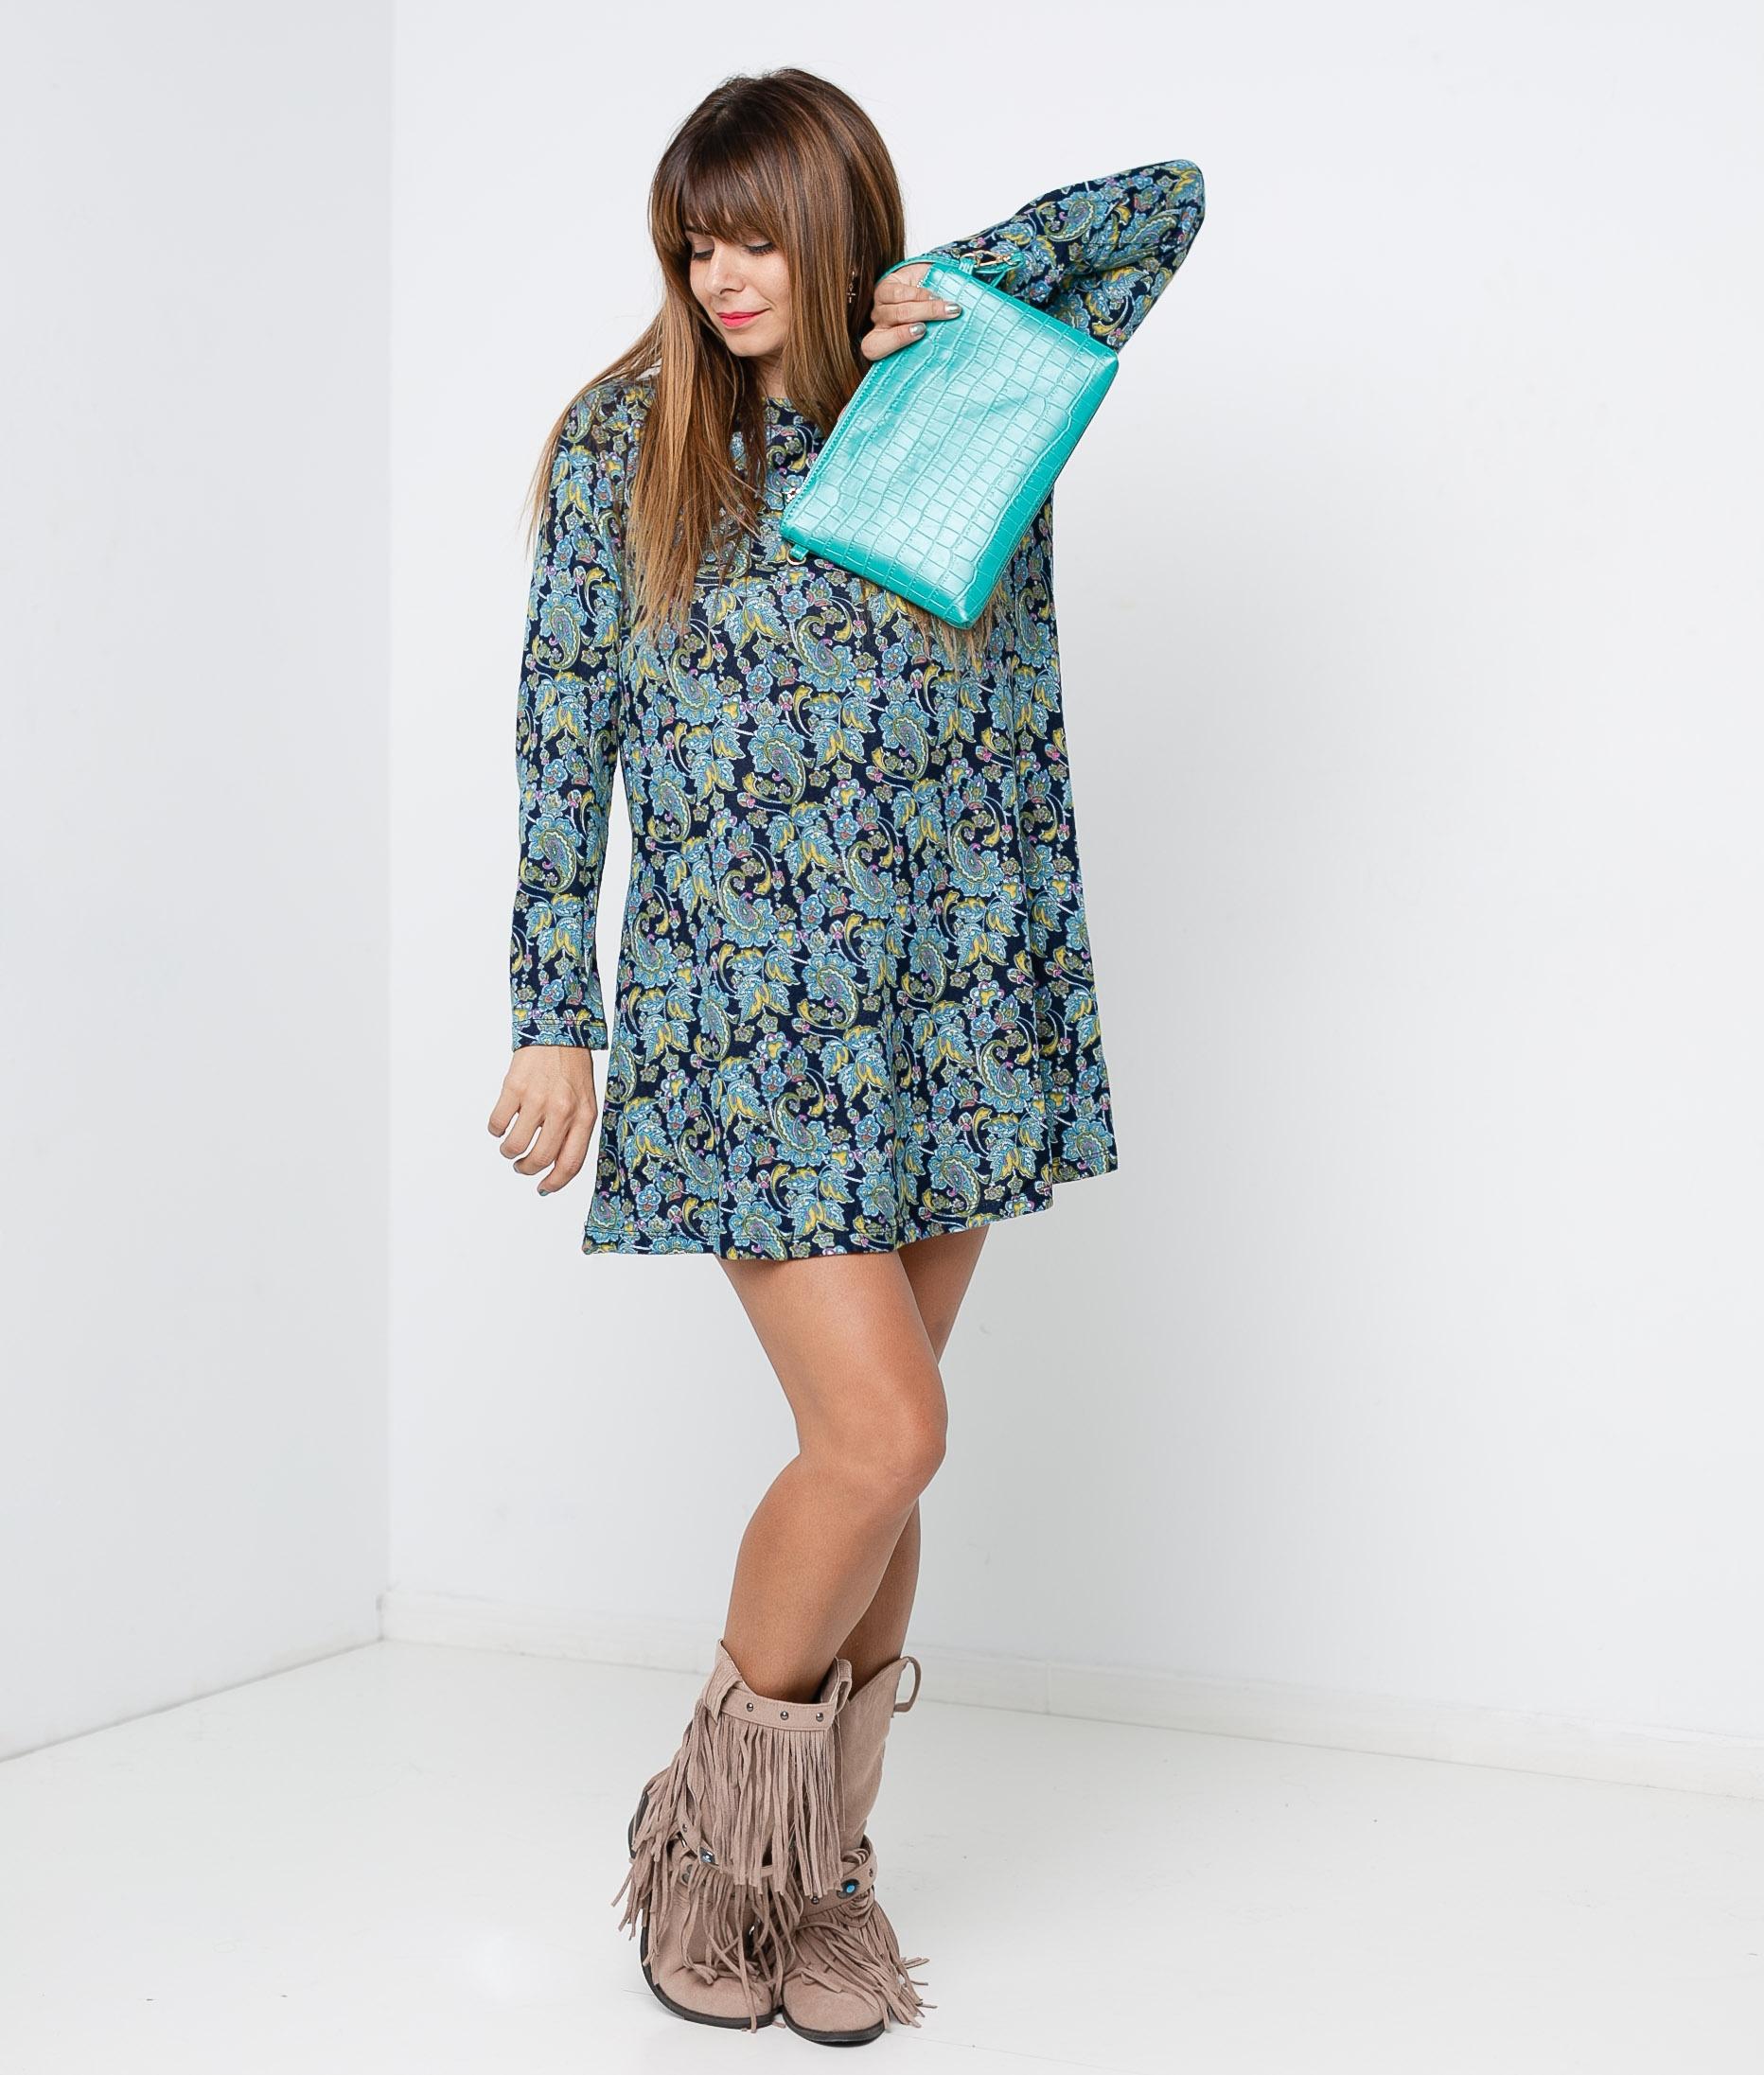 FILIN DRESS - BLUE